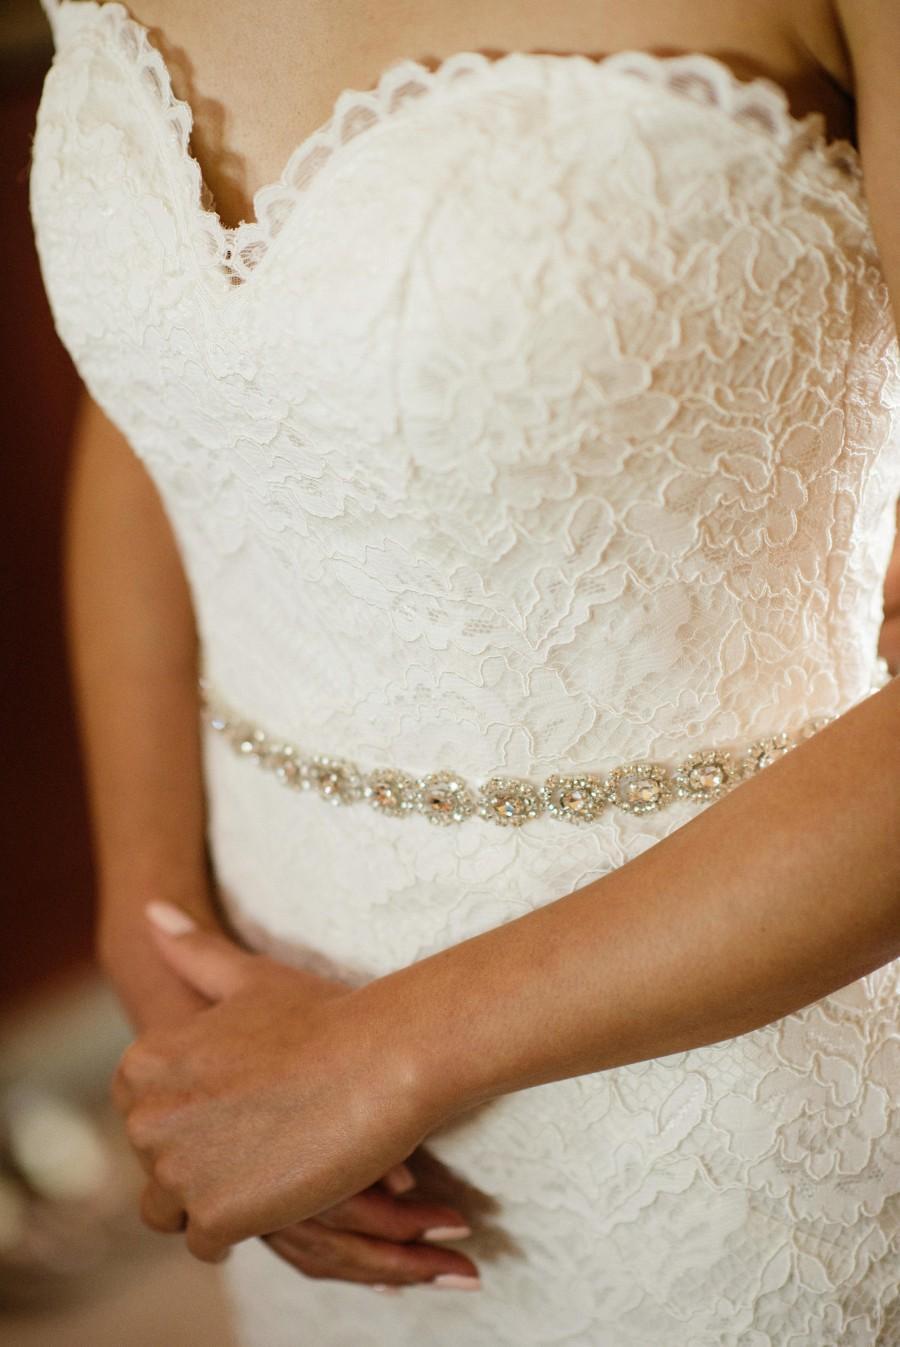 Hochzeit - Bridal Sash, Wedding Sash, Bridal Belt, Crystal Bridal Sash, Rhinestone Sash, Jeweled Belt Wedding Gown Belt Thin Bridal Belt Swarovski Sash